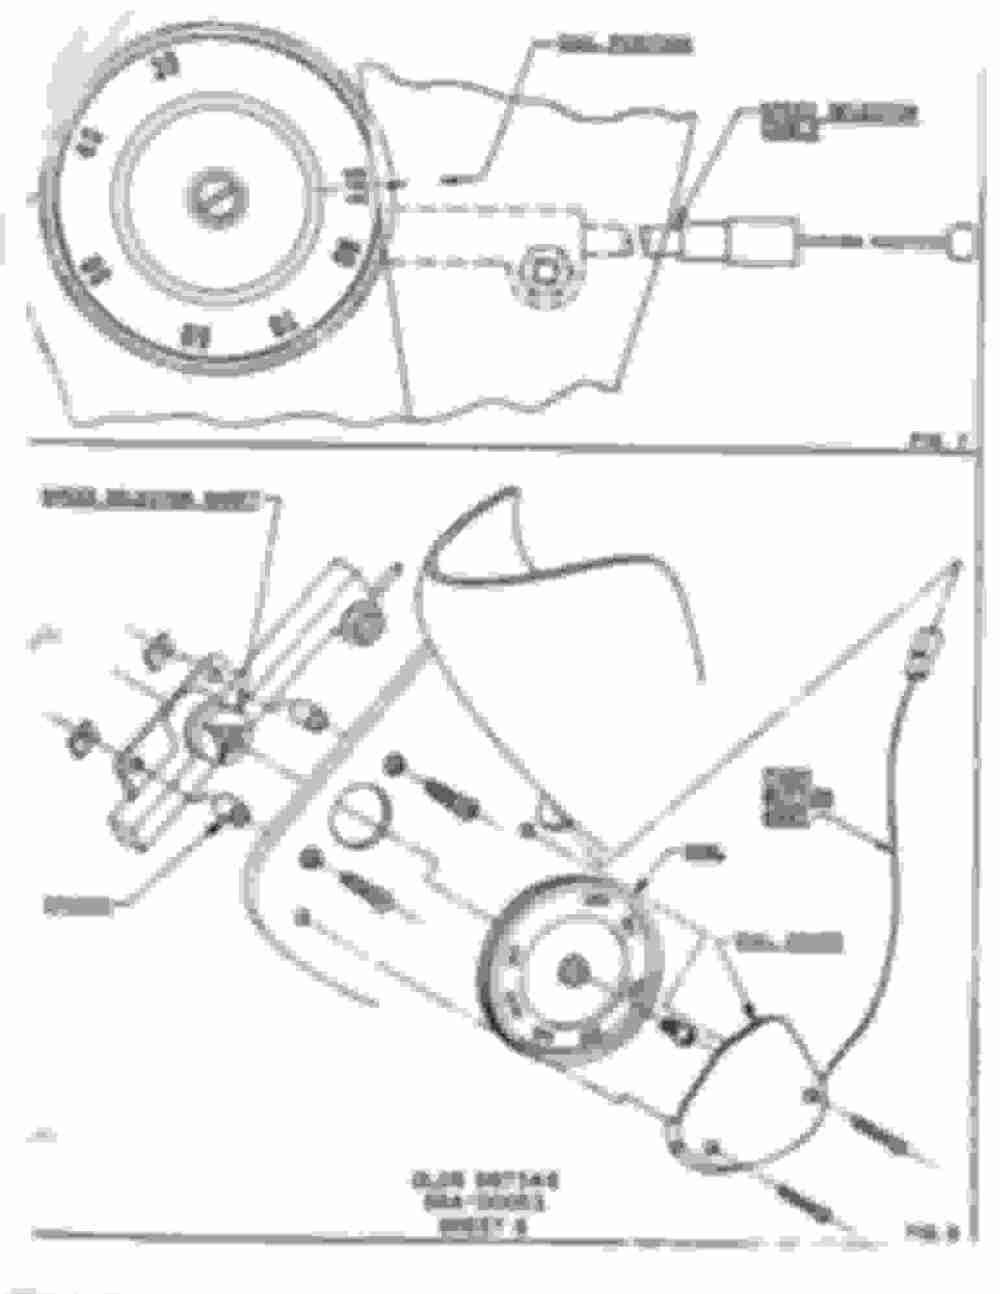 medium resolution of  perfect circle cruise control wiring diagram wiring diagram h8 on bose 321 speaker wiring gm